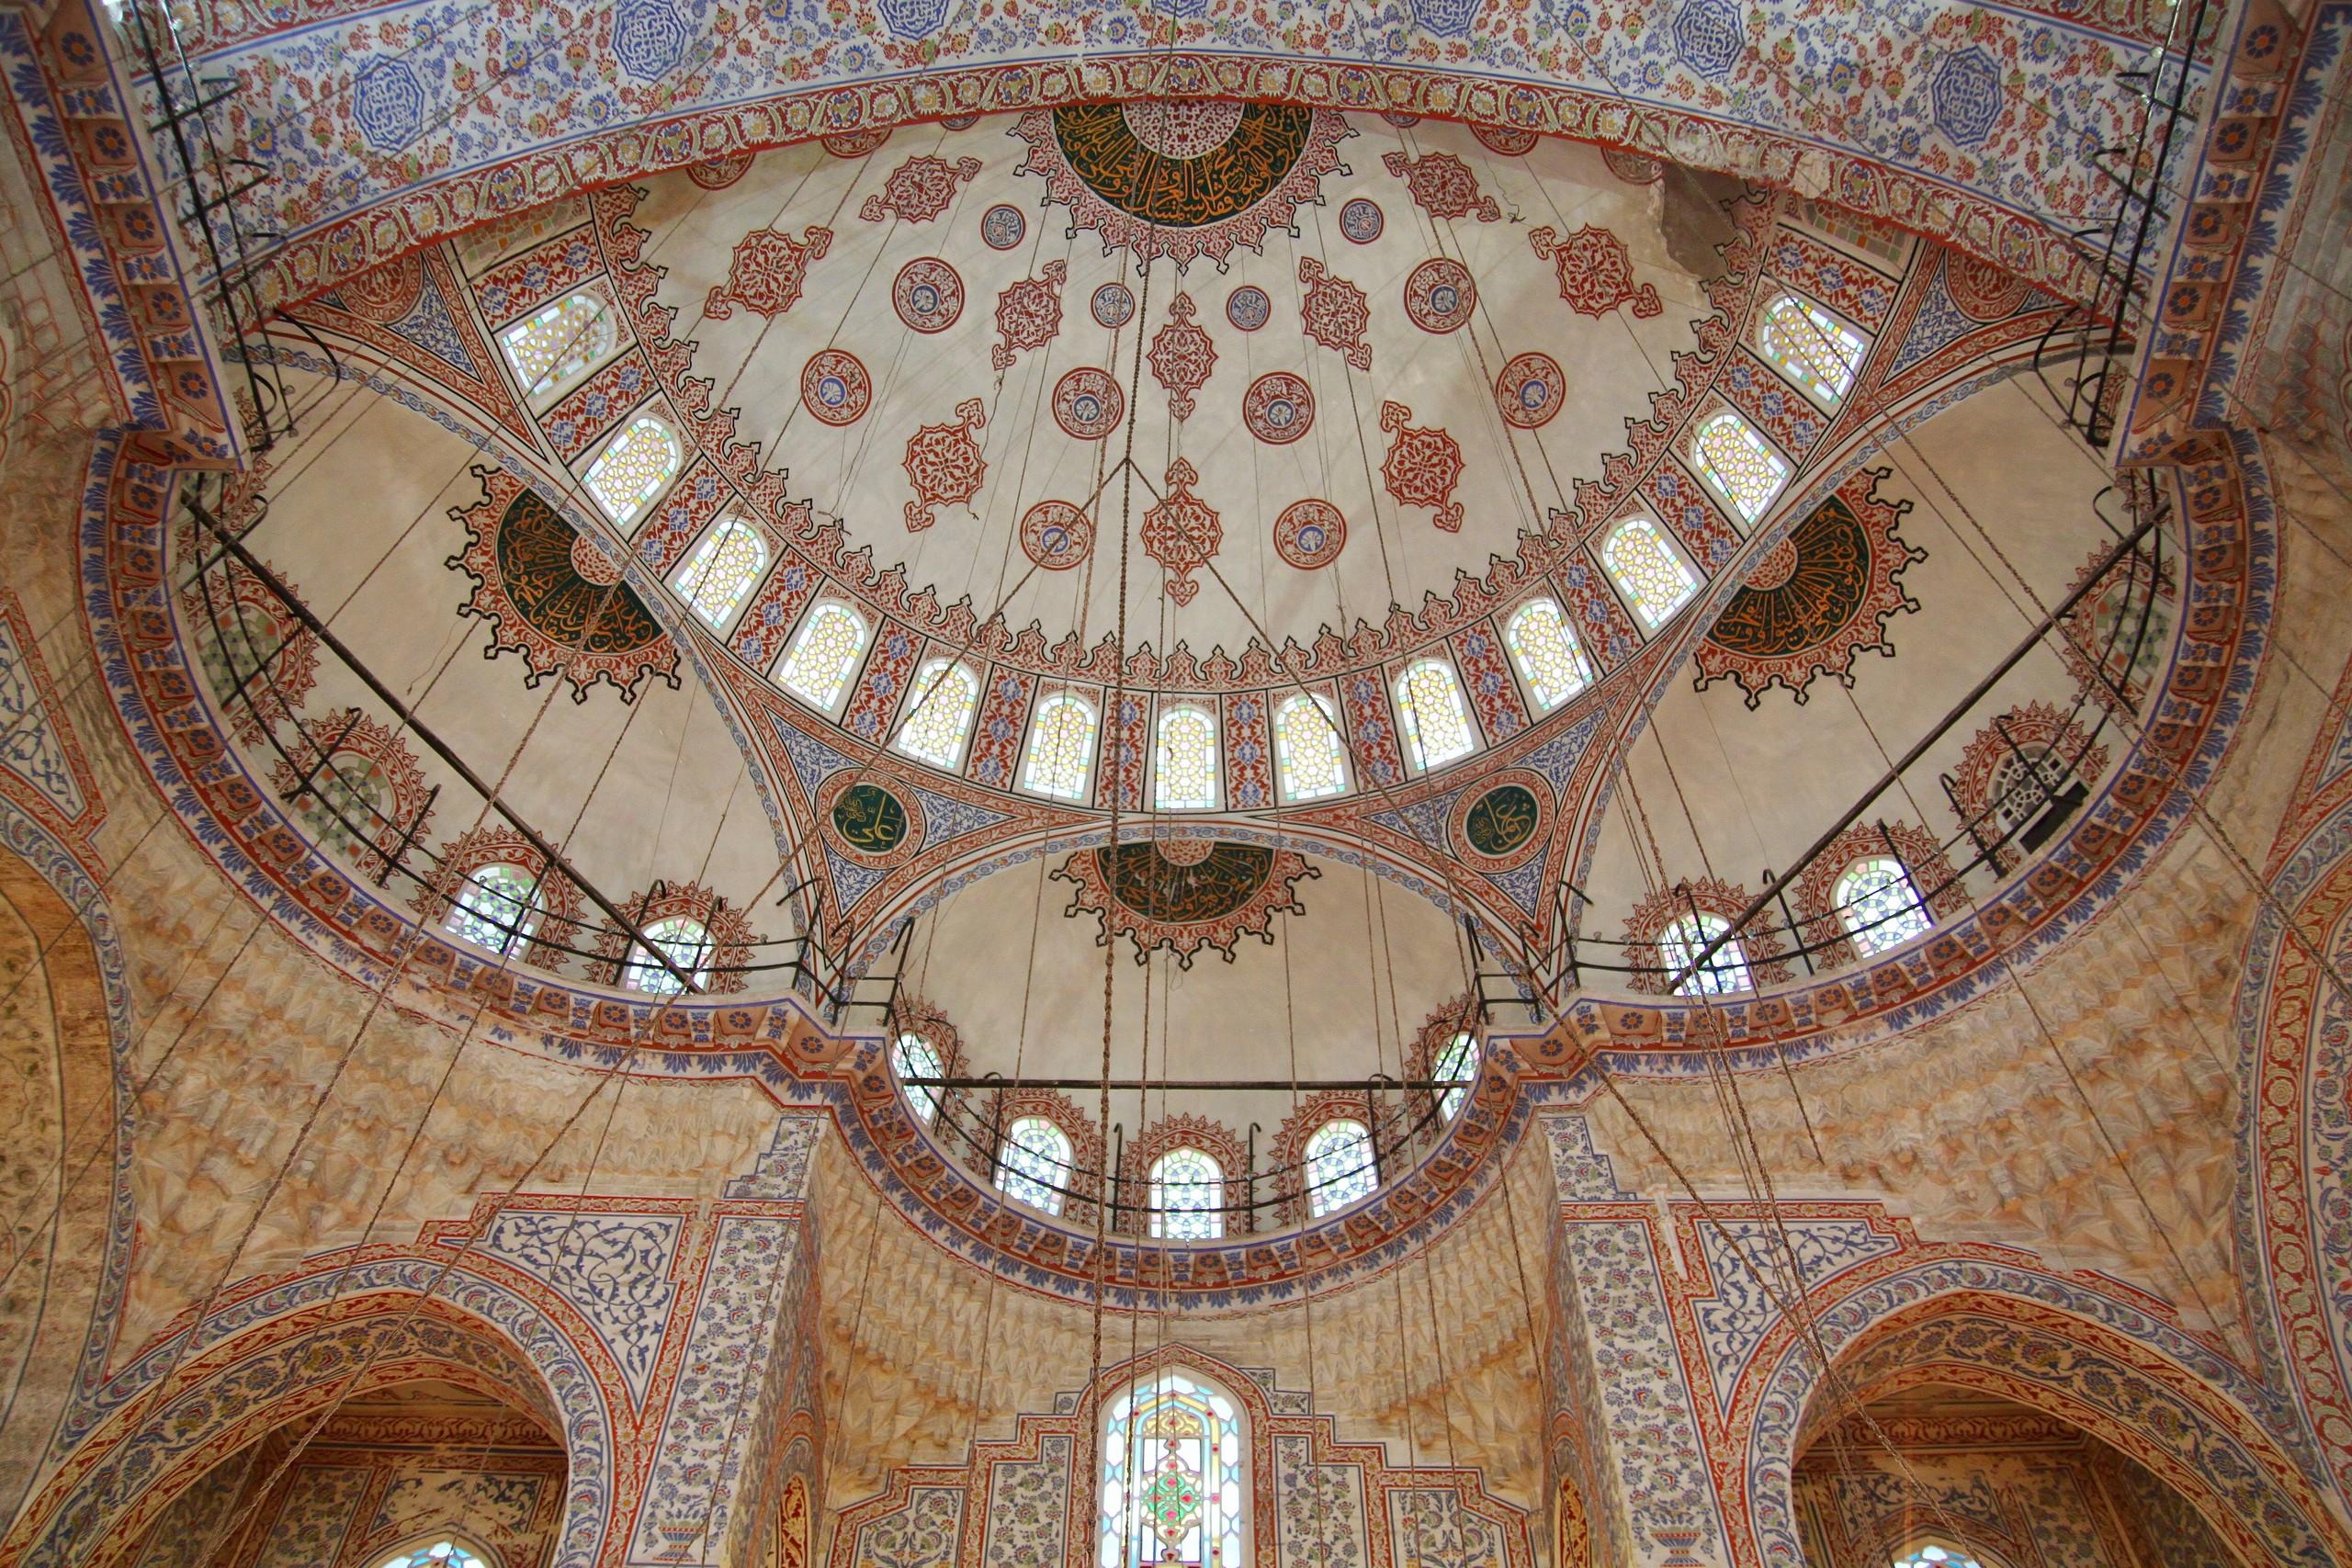 Pırlantadan Kubbeler #5: Sultanahmed - X485vo - Pırlantadan Kubbeler #5: Sultanahmed